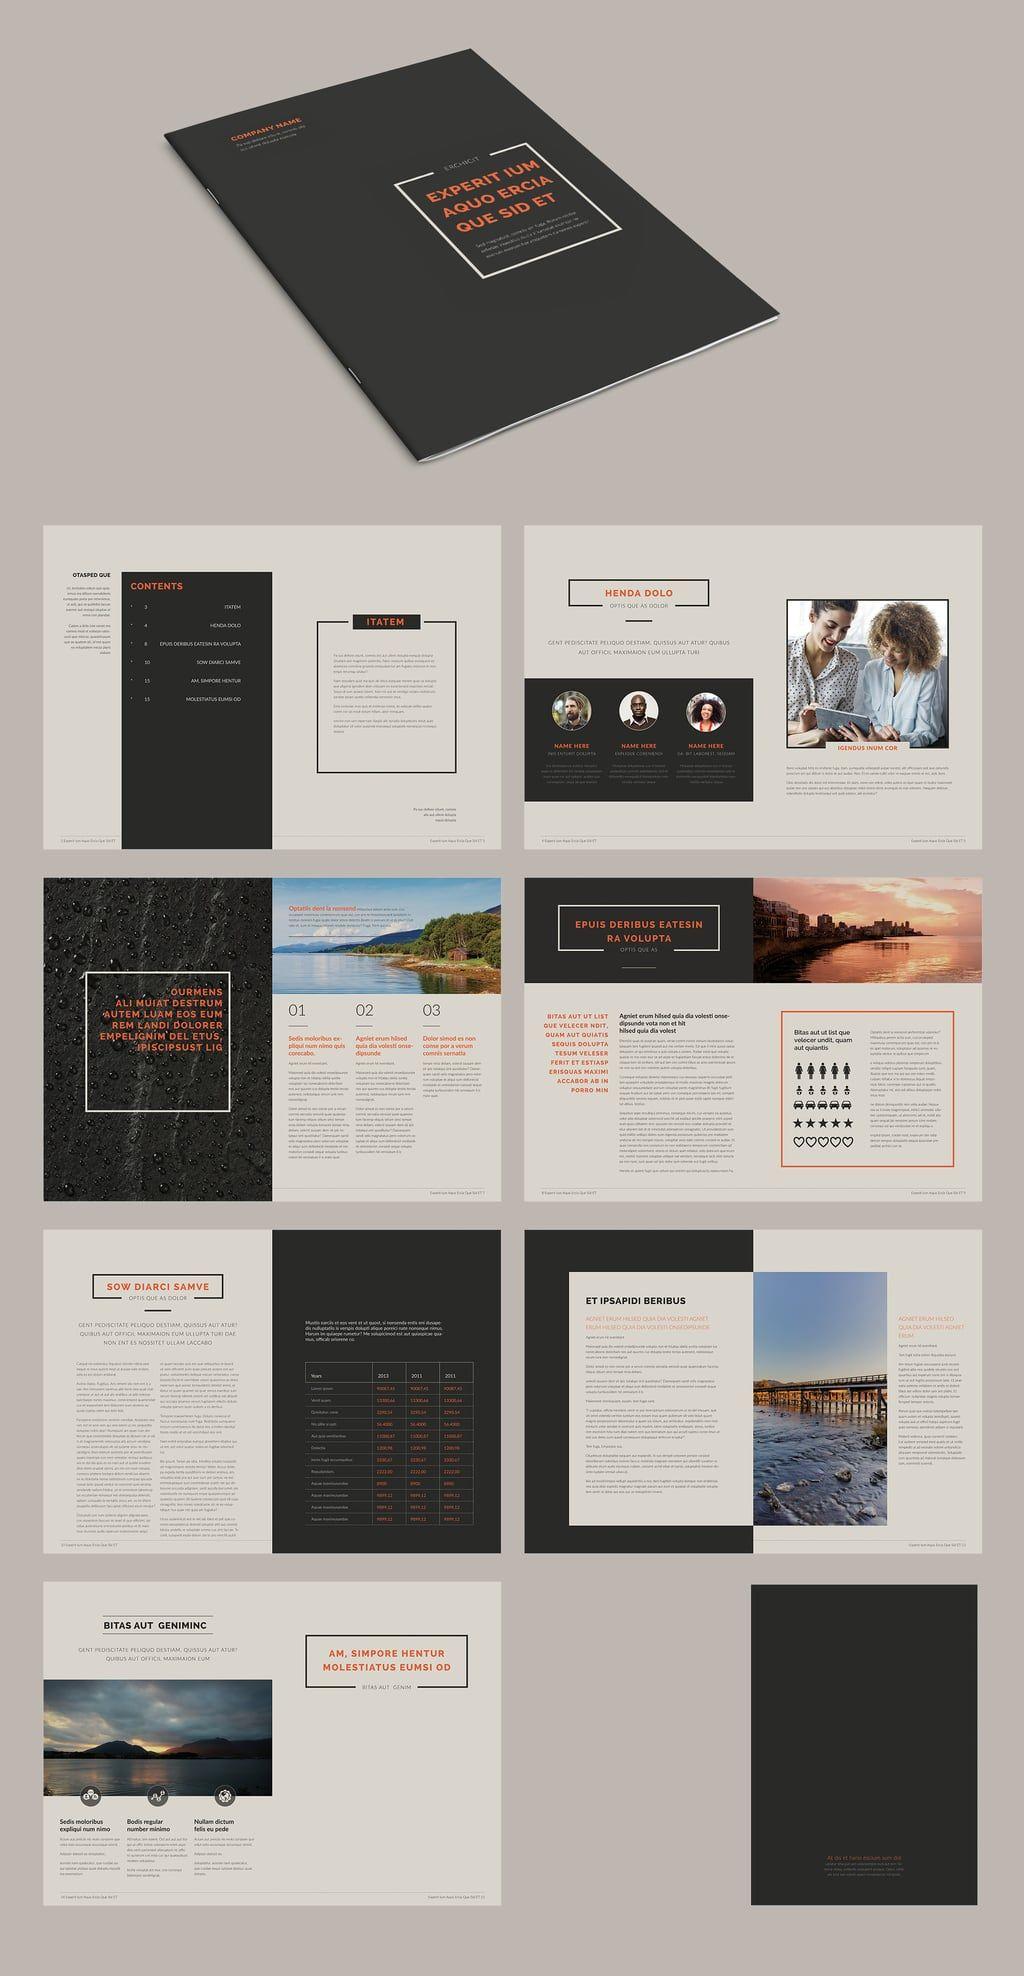 100 Best Indesign Brochure Templates throughout Brochure